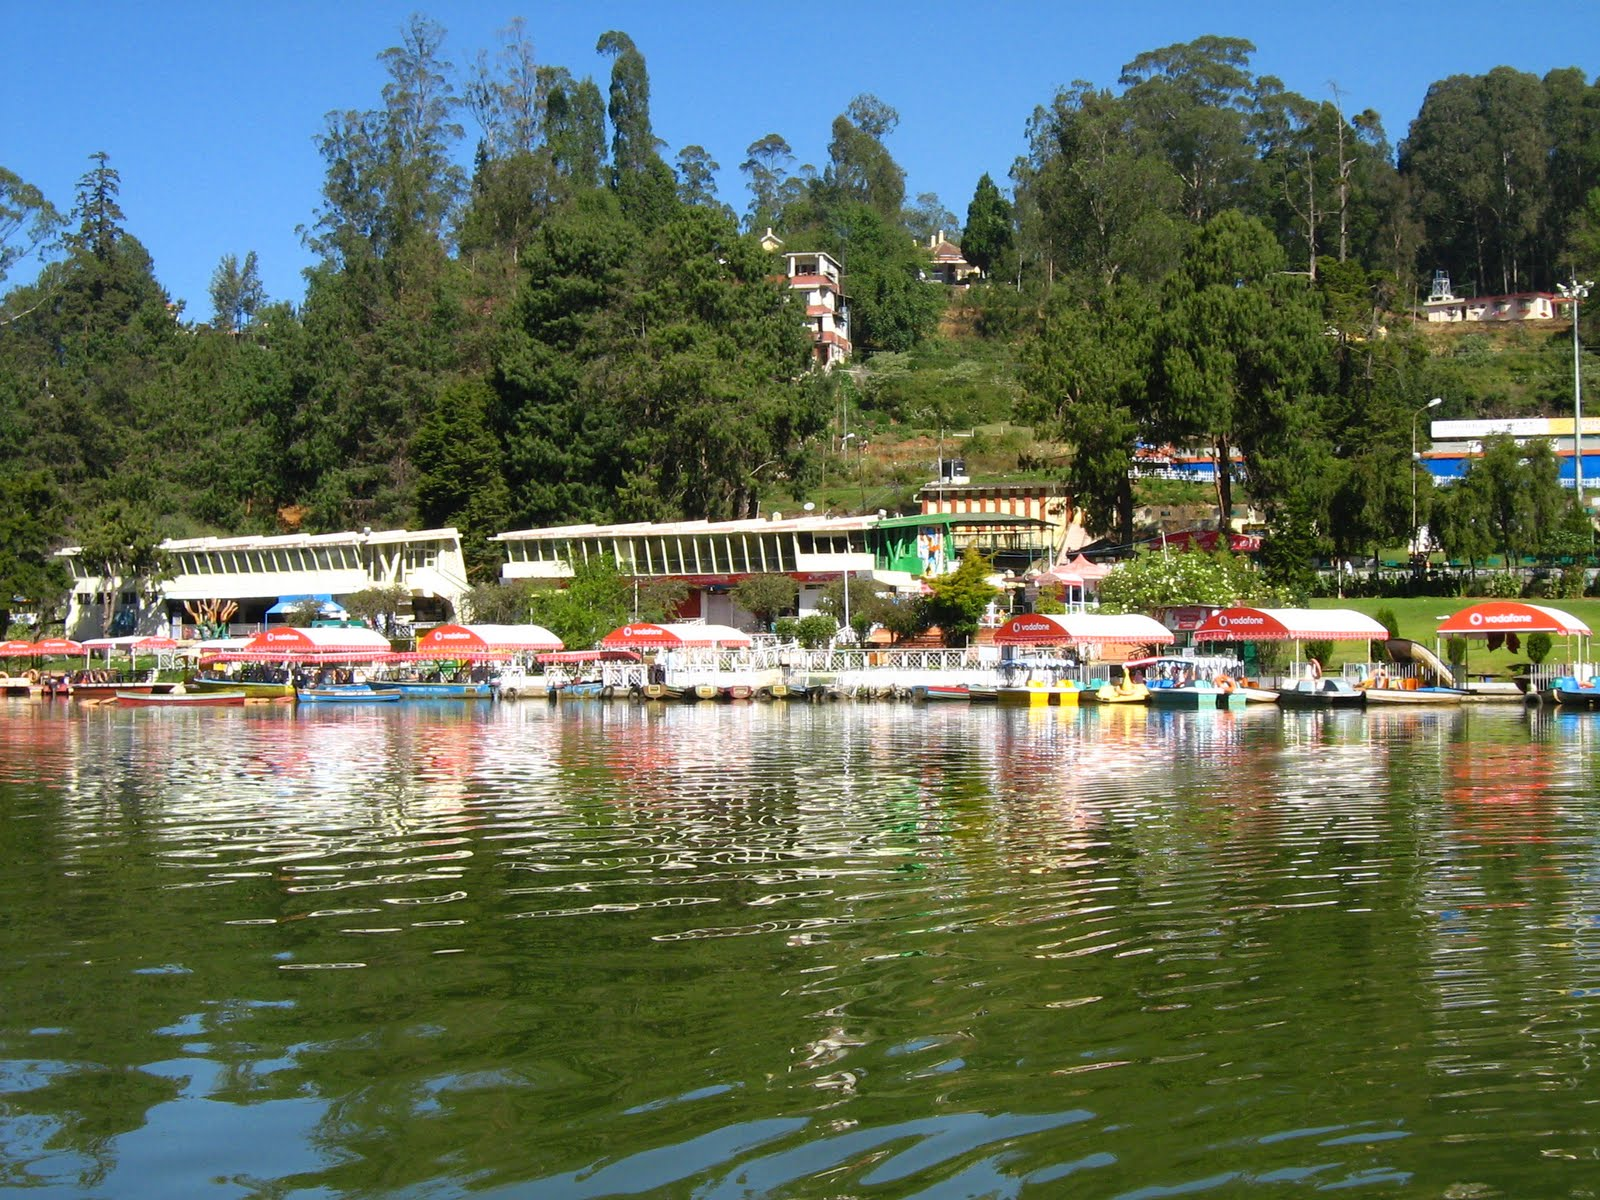 Ooty Lake - Ooty Image